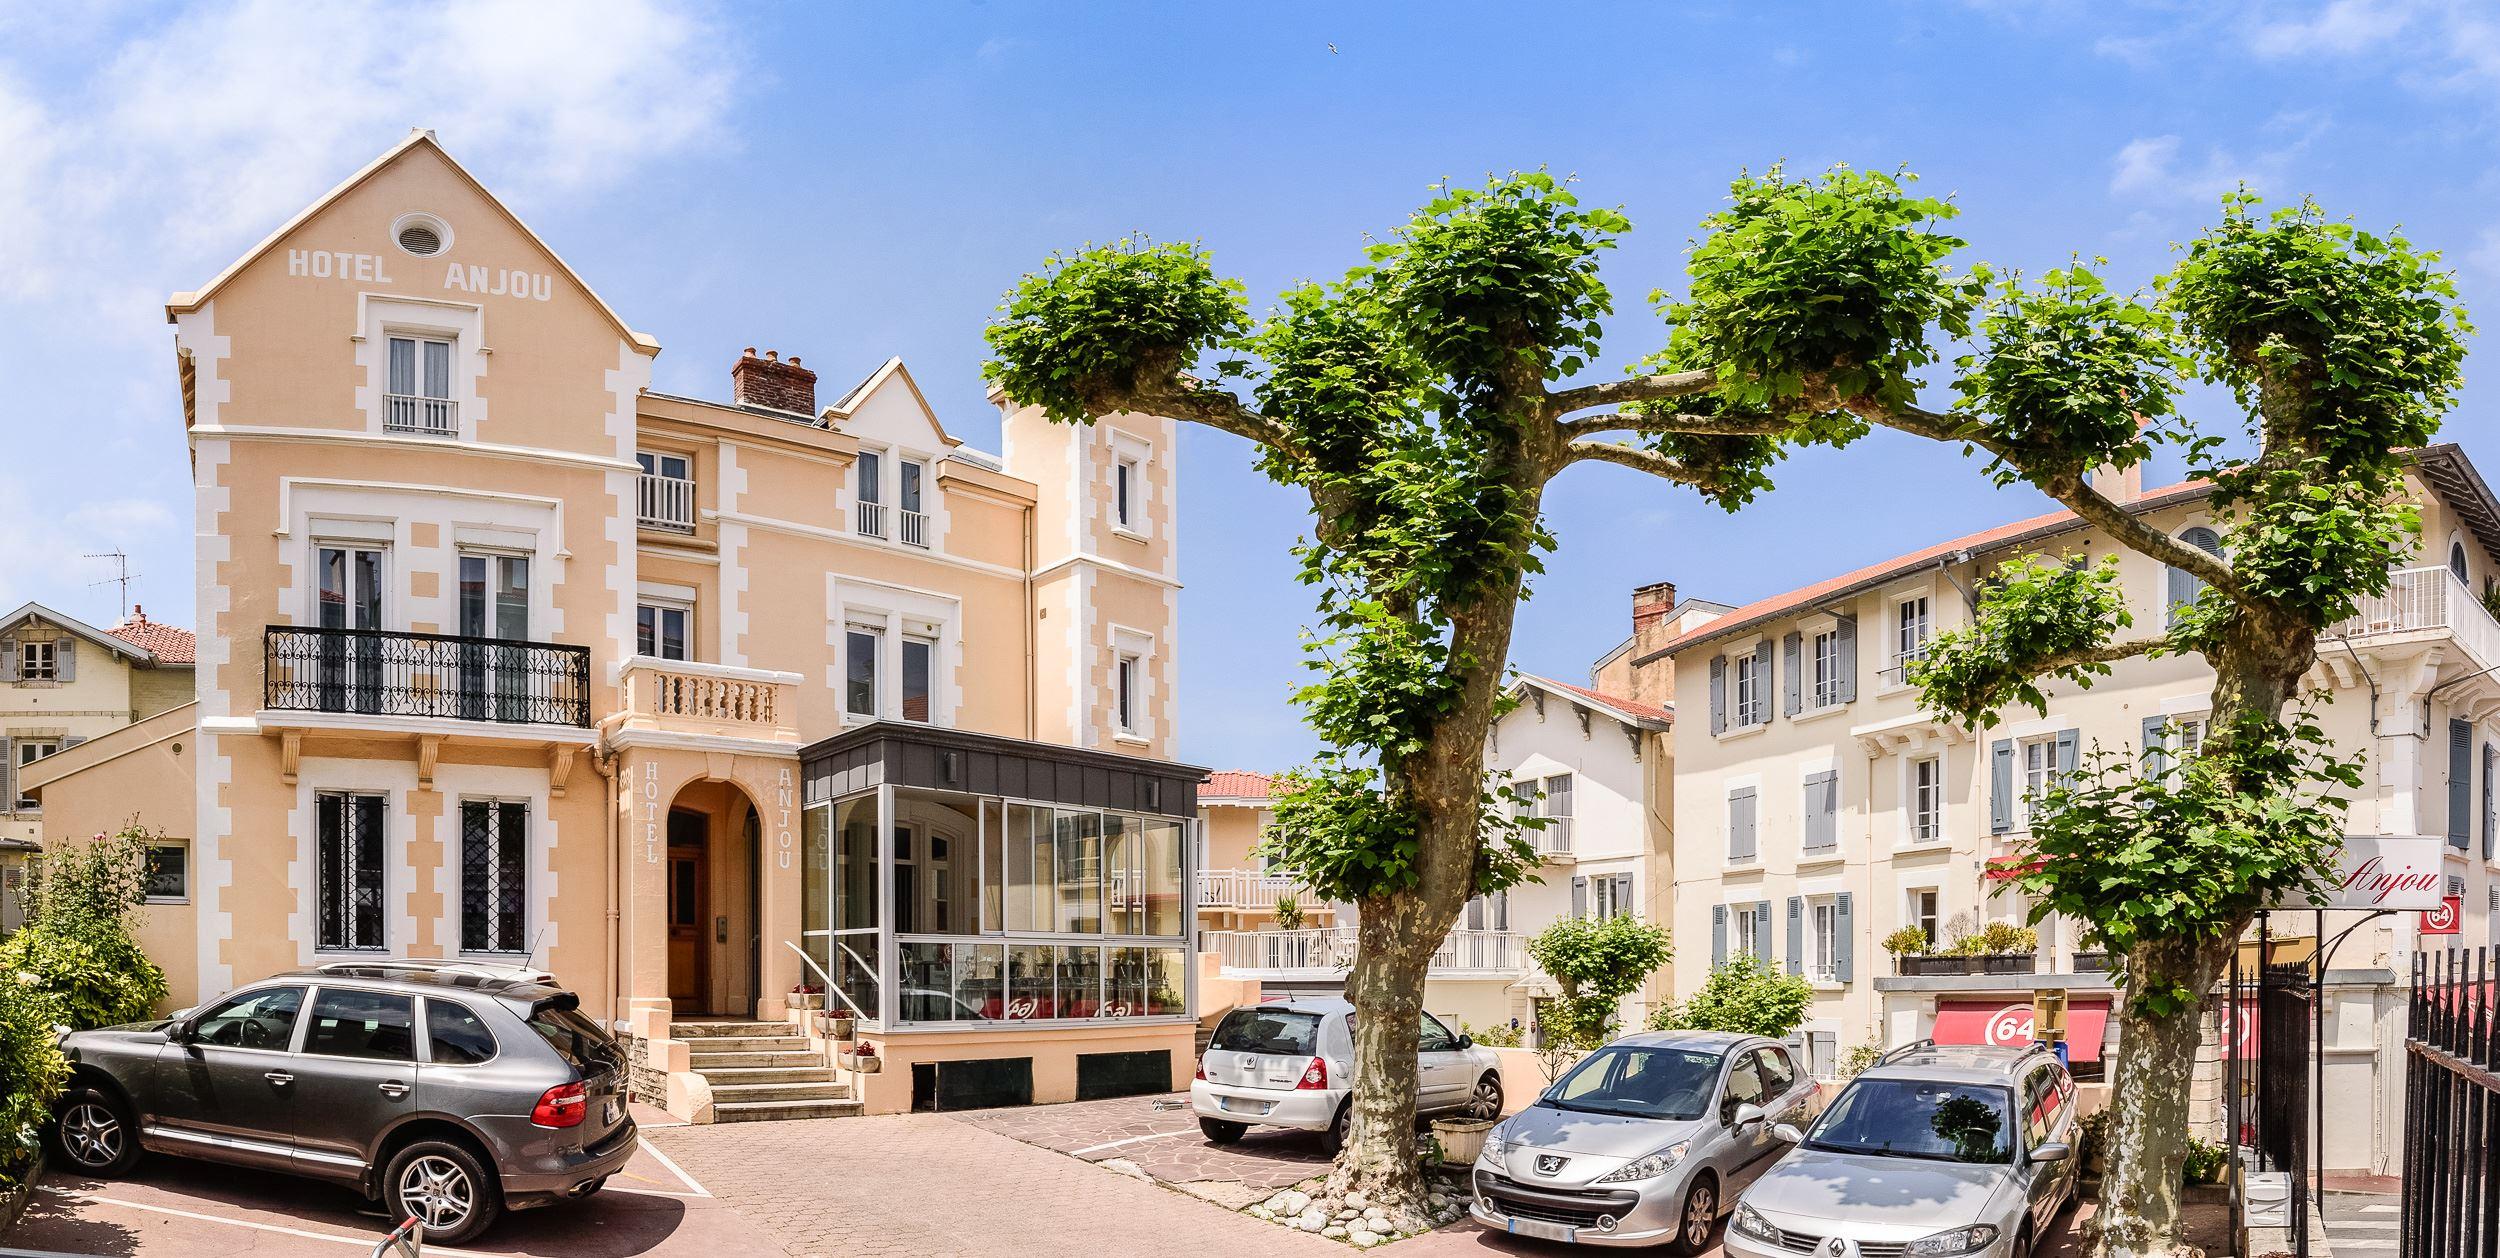 Hôtel Anjou